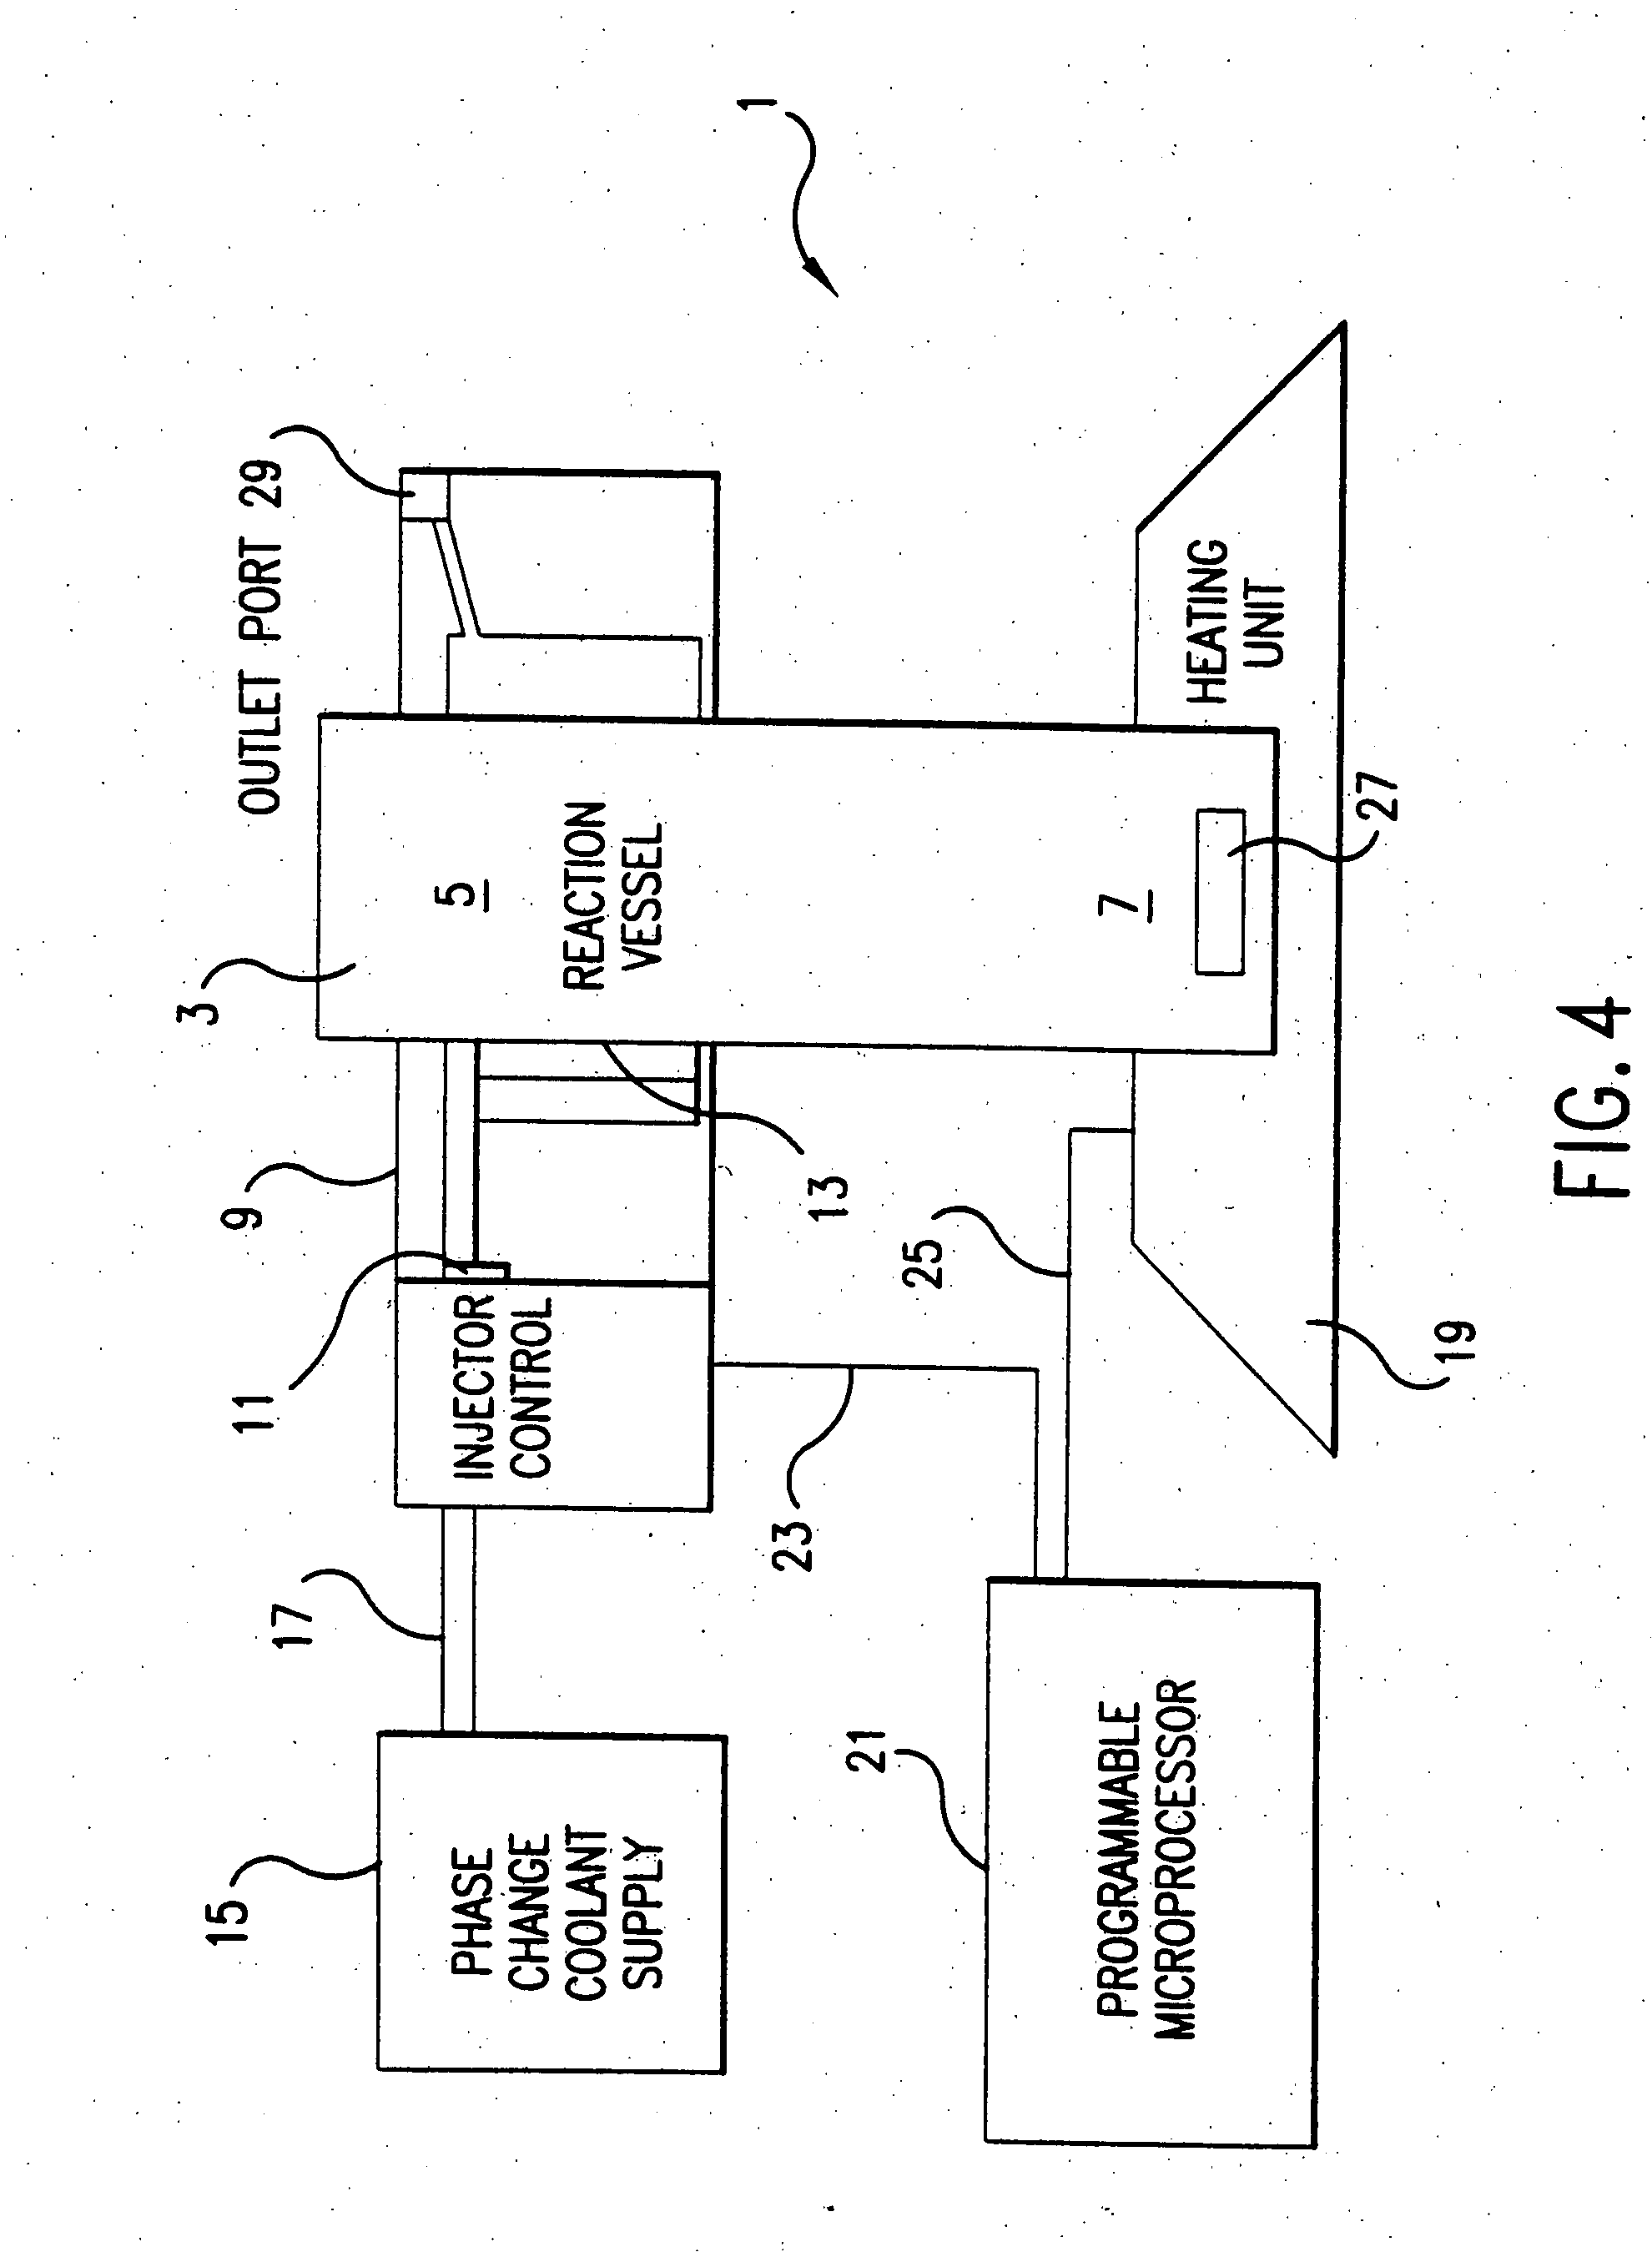 Patent US20070231223 - Multifunctional multireactor control